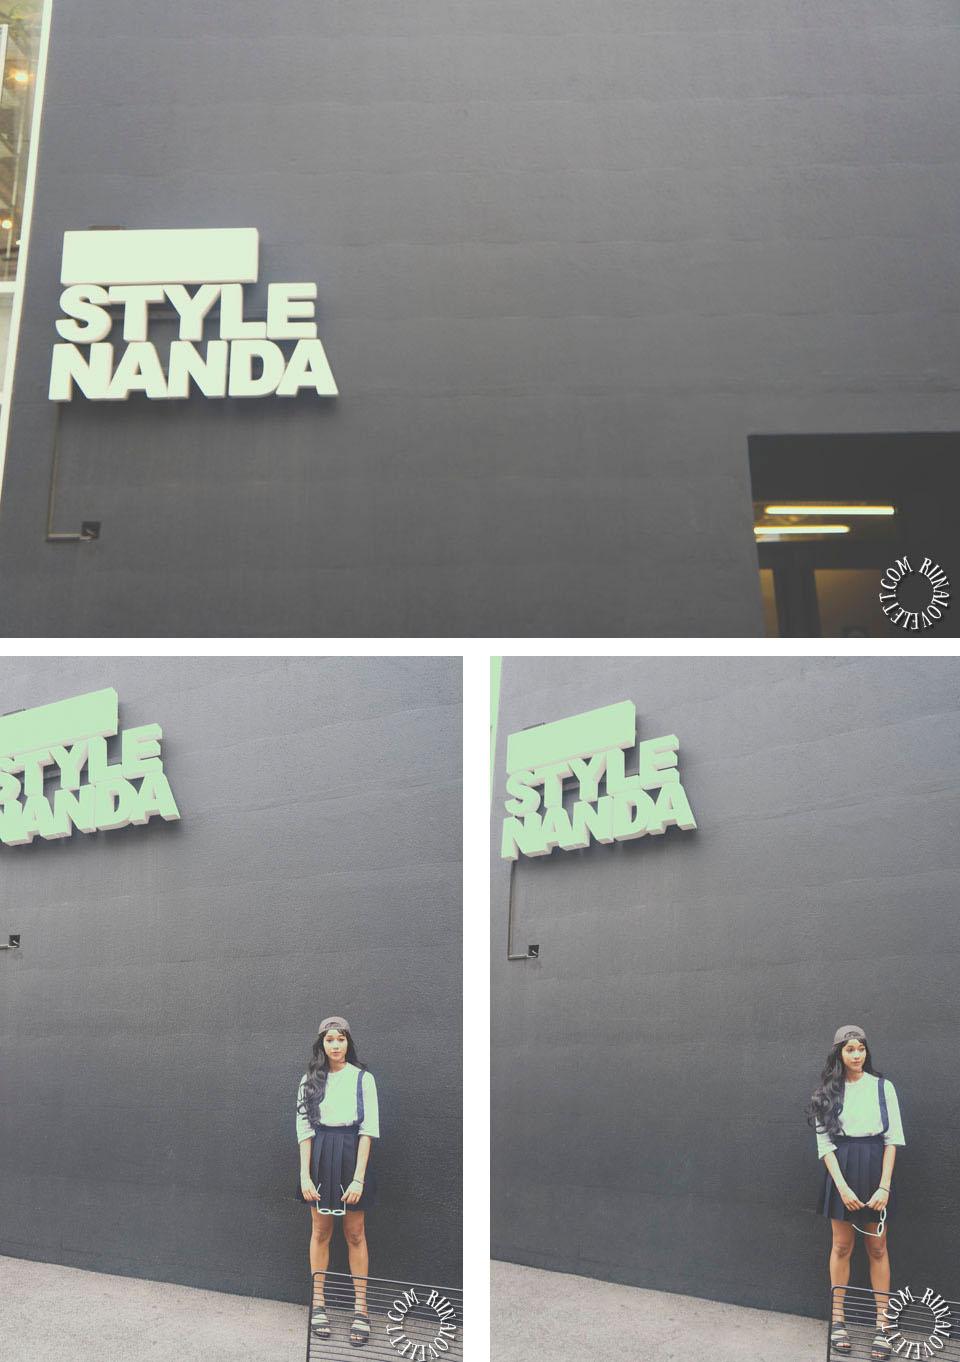 Stylenandaflagshipstore